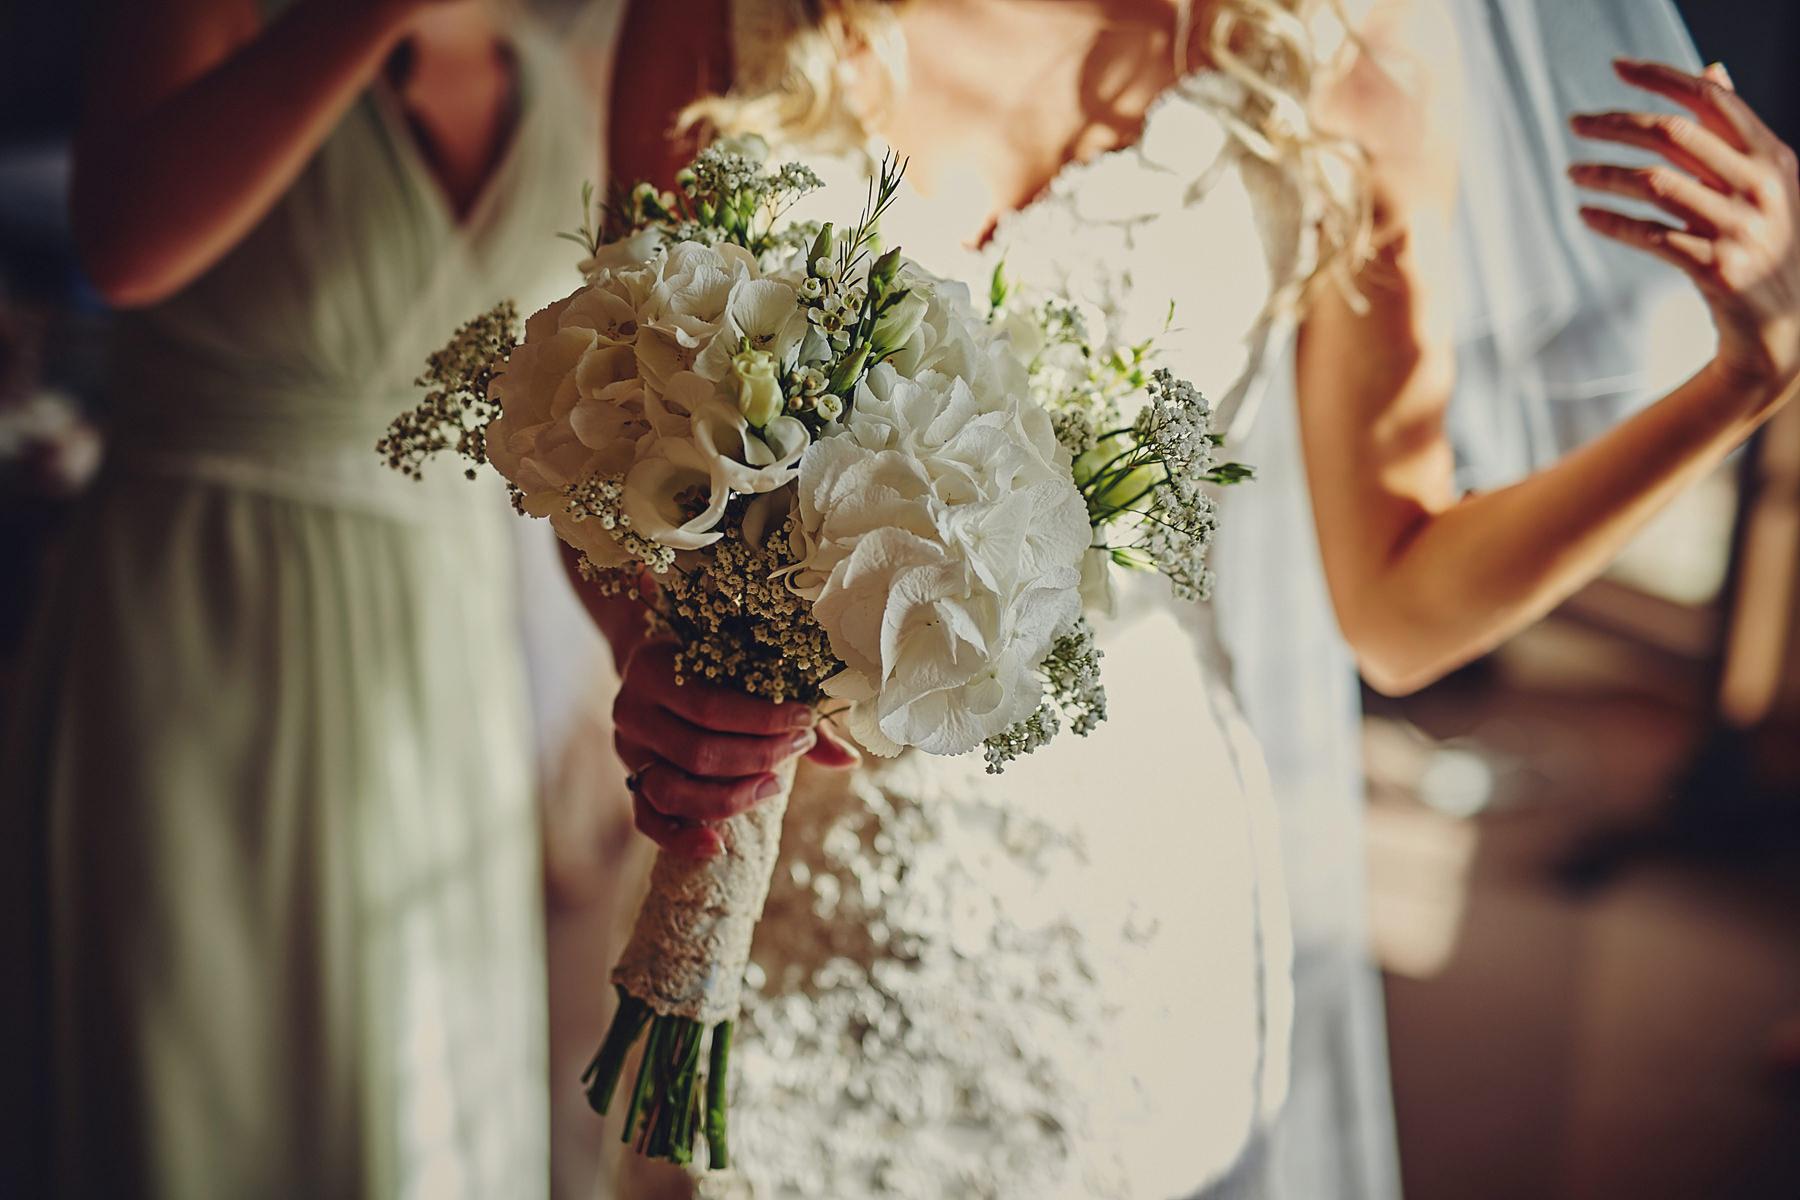 Wedding at Borris House co.Carlow 028 - Borris House wedding | Cara & David